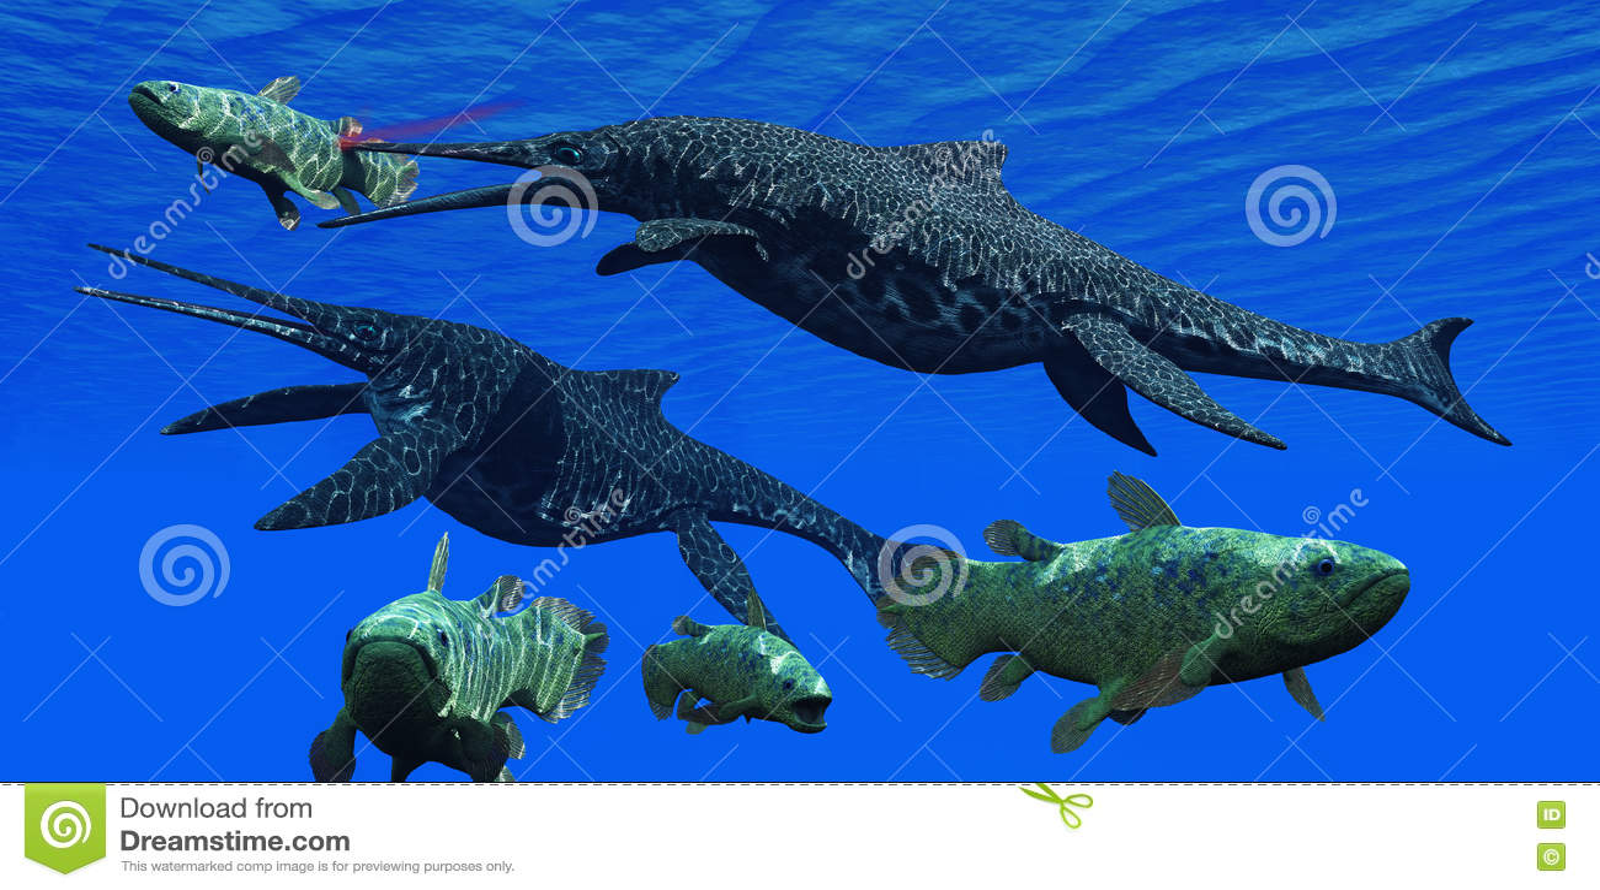 Triassic Shonisaurus Marine Reptile Stock Illustration - Image: 71155788